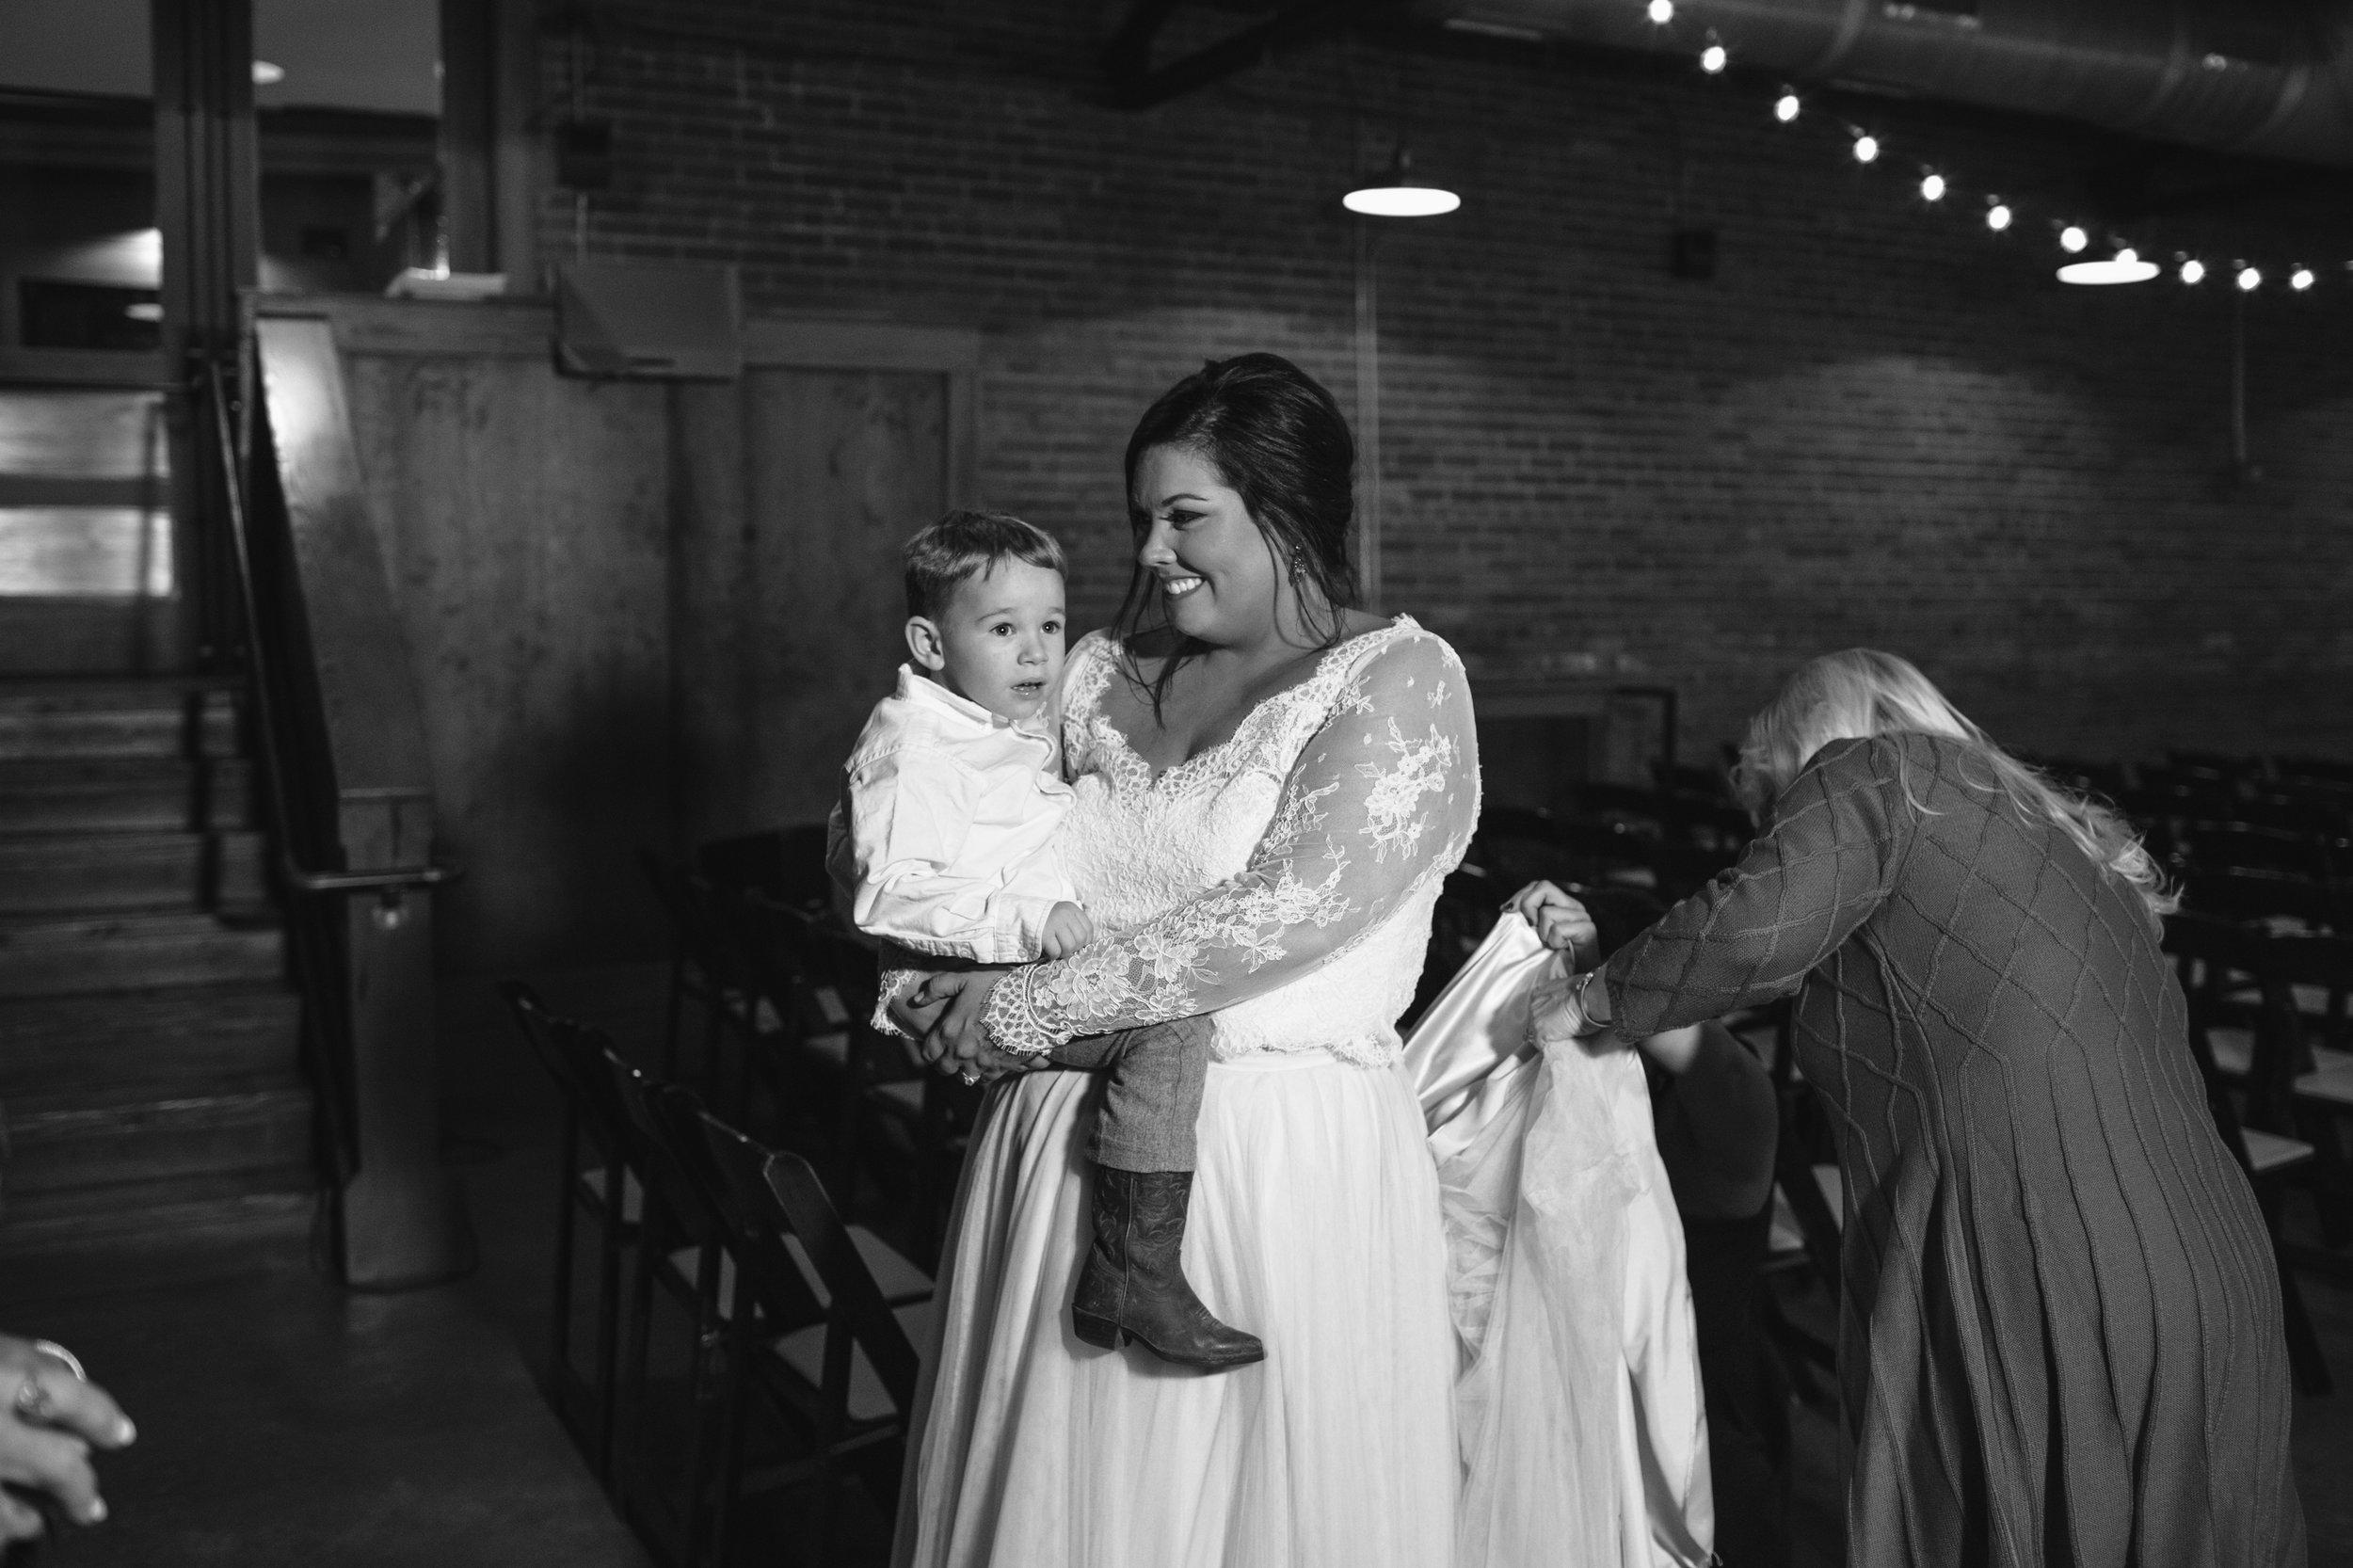 Lauren_Jeremy_Standard_Wedding_Knoxville_Abigail_Malone_Photography_FIlm-519.jpg